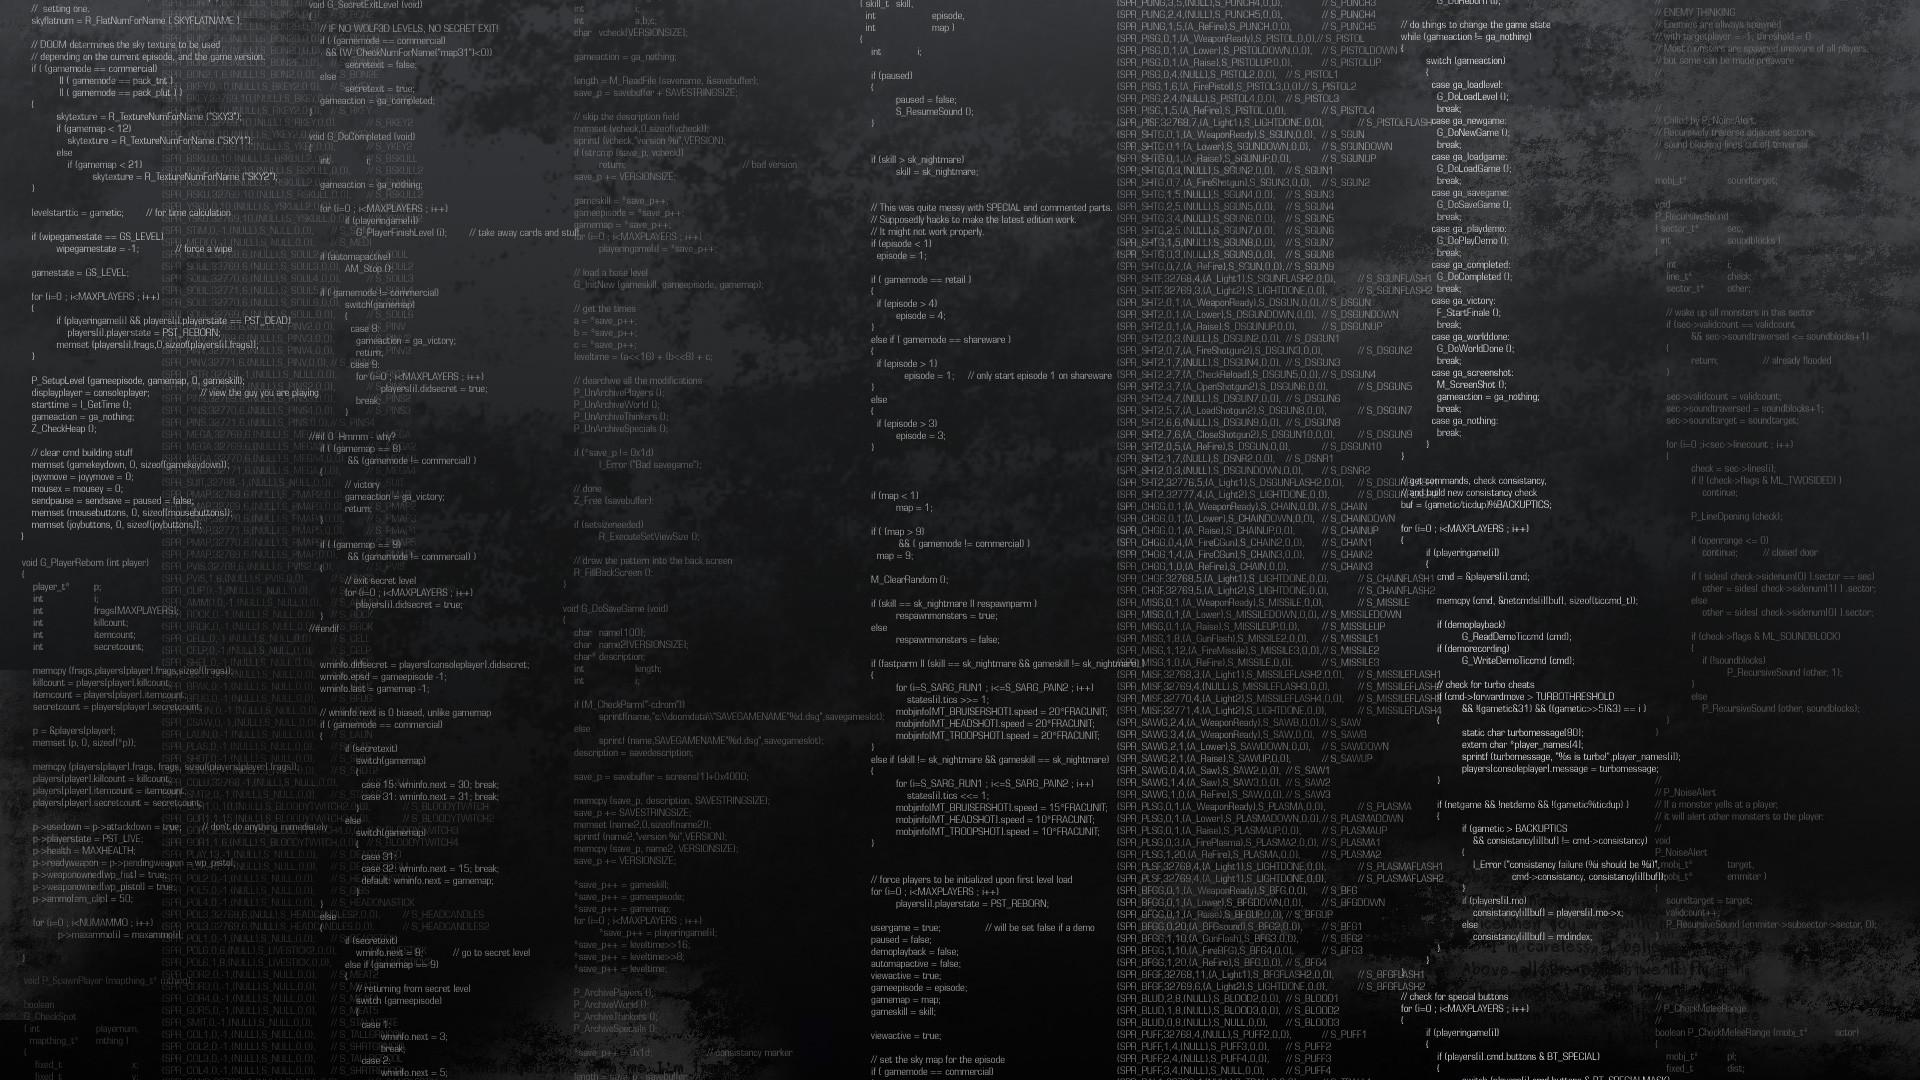 Code Hacker Hd Computer 4k Wallpapers Images Backgrounds Photos